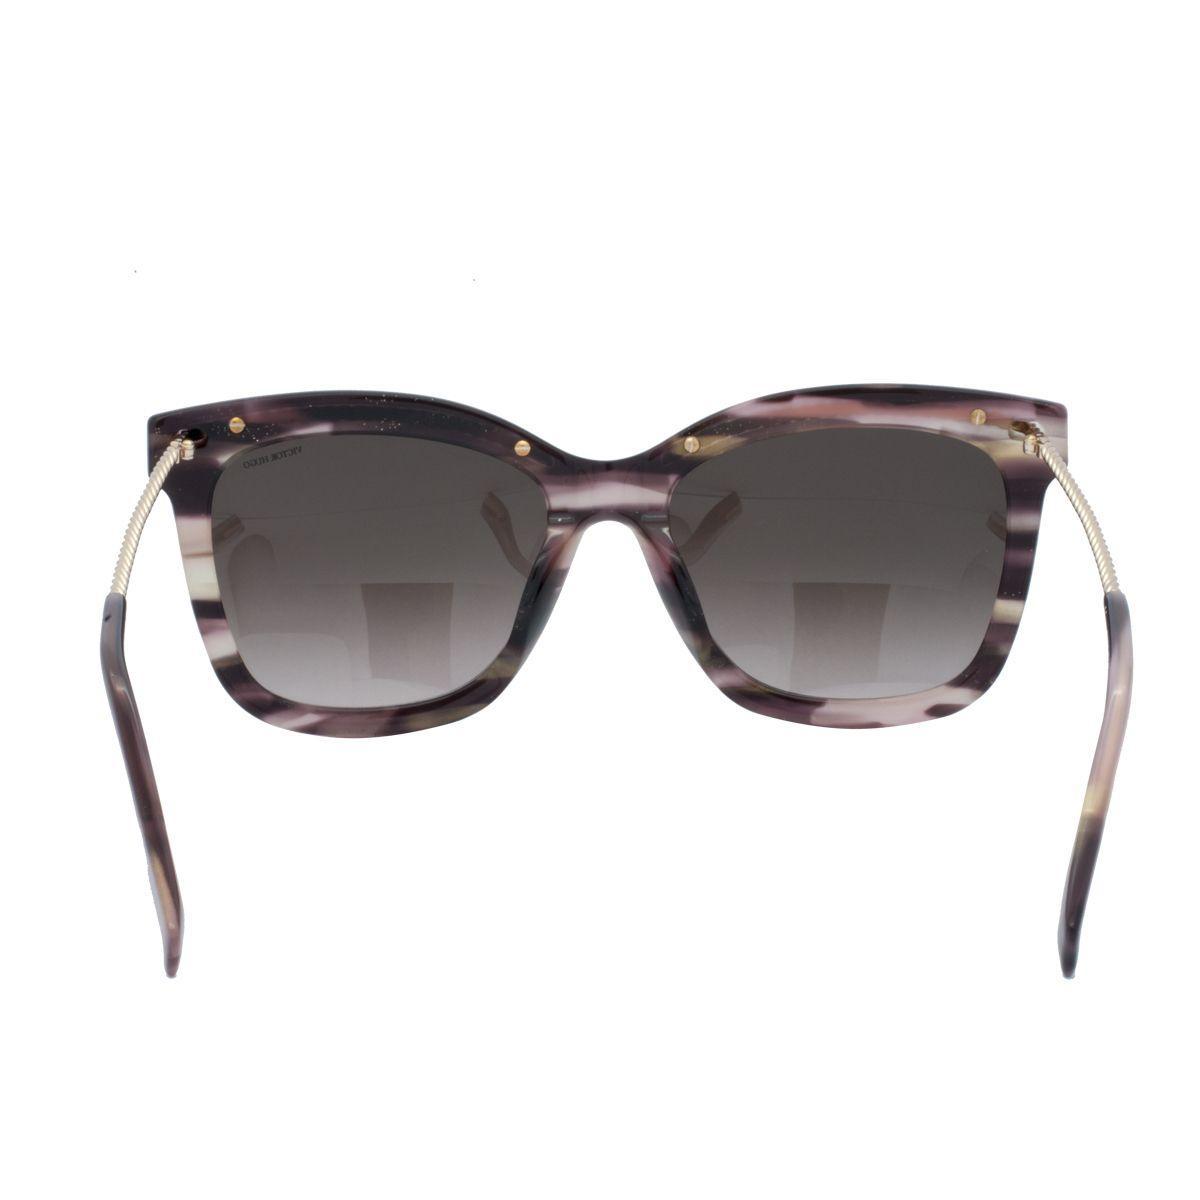 86d2611306990 Óculos de Sol Victor Hugo Feminino SH1774 0D00 - Acetato Marrom Mescla e Lente  Marrom Degradê R  983